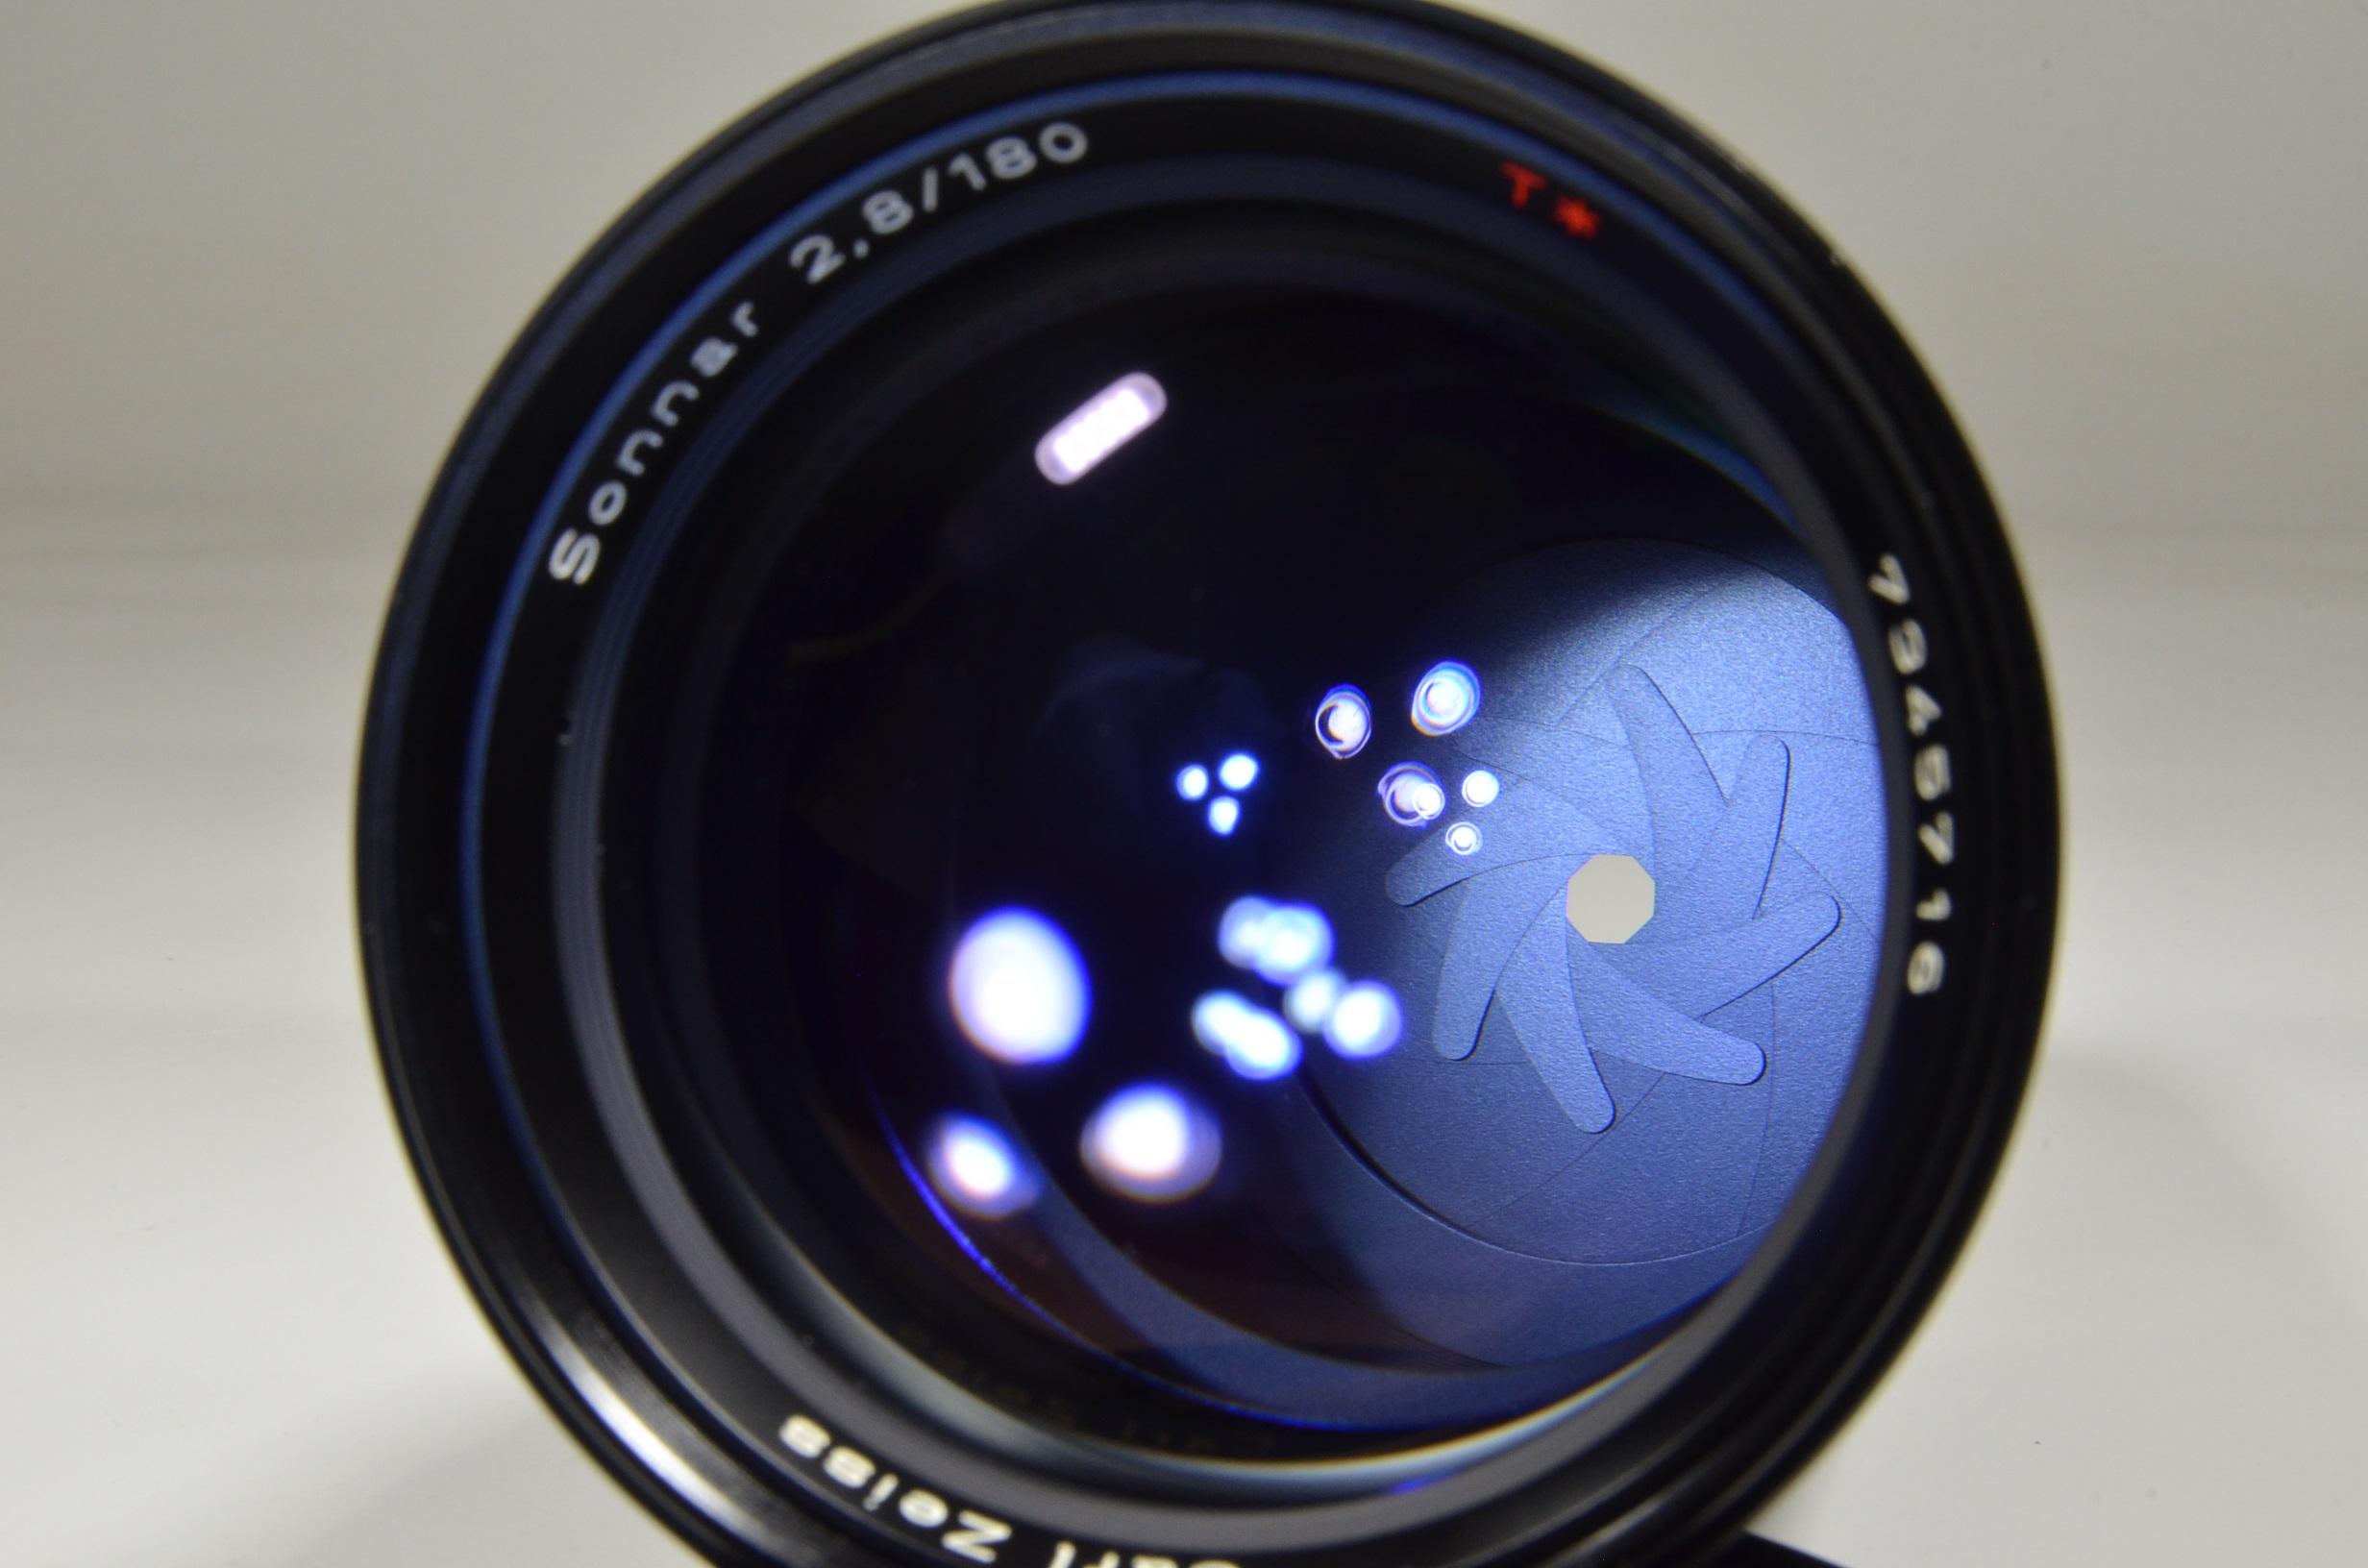 contax carl zeiss sonnar t* 180mm f2.8 mmj